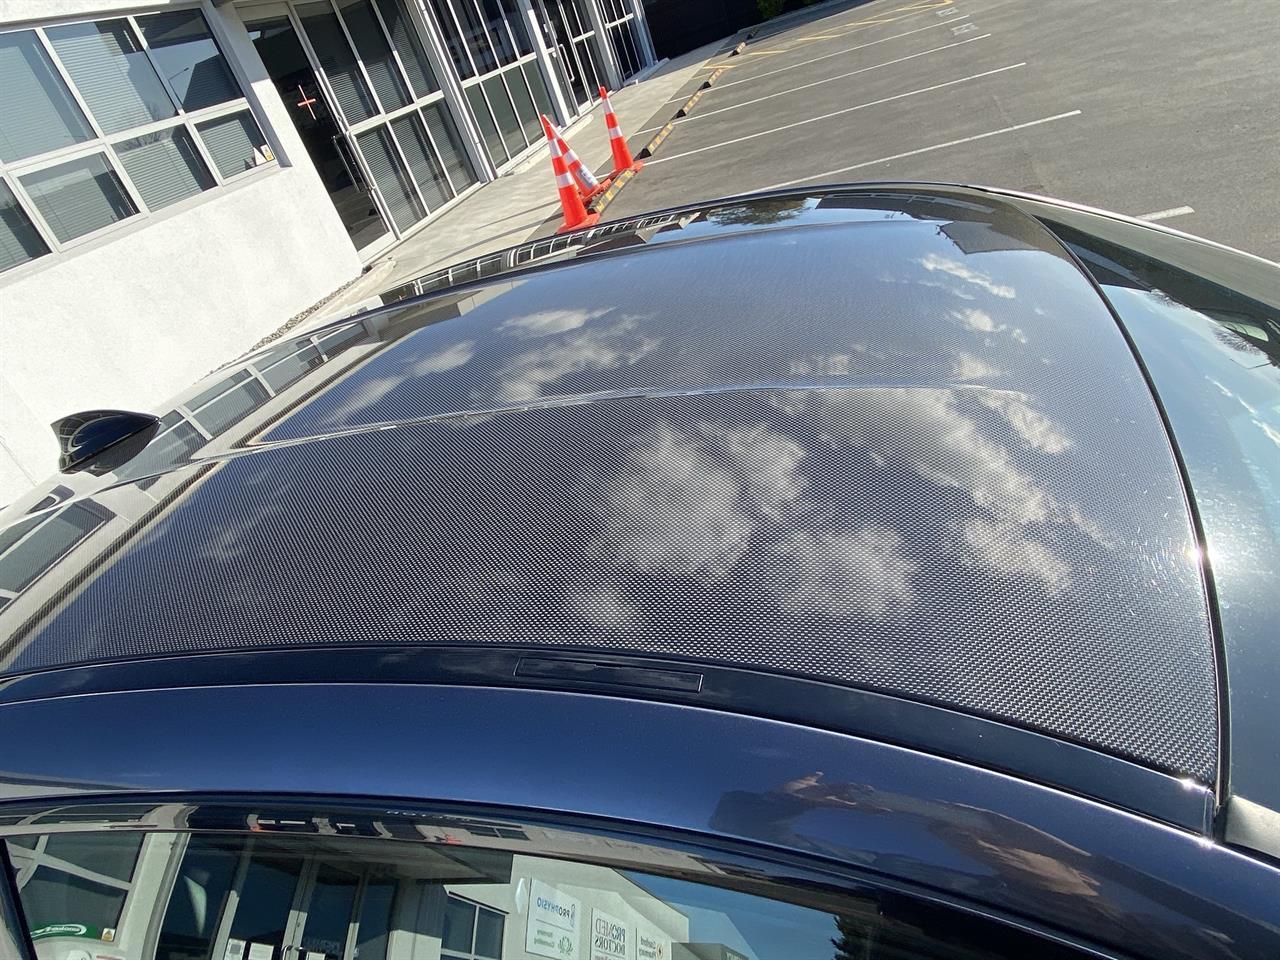 image-5, 2014 BMW M4 at Christchurch